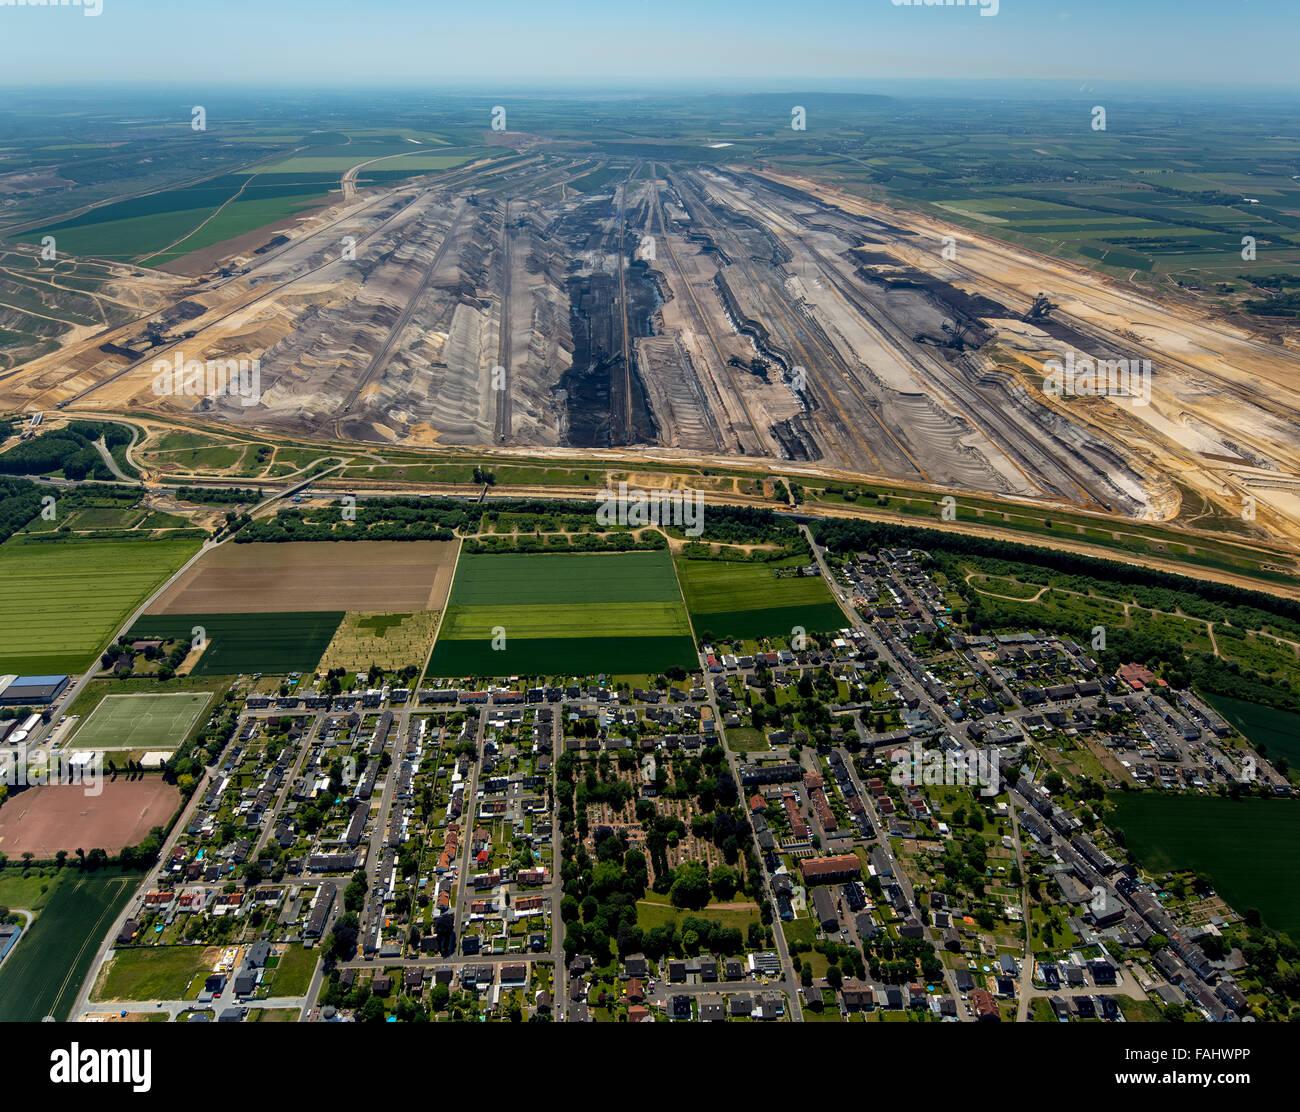 Aerial view, lignite, brown coal mining Garzweiler in Juchen, energy, lignite excavator, bucket wheel excavators, - Stock Image